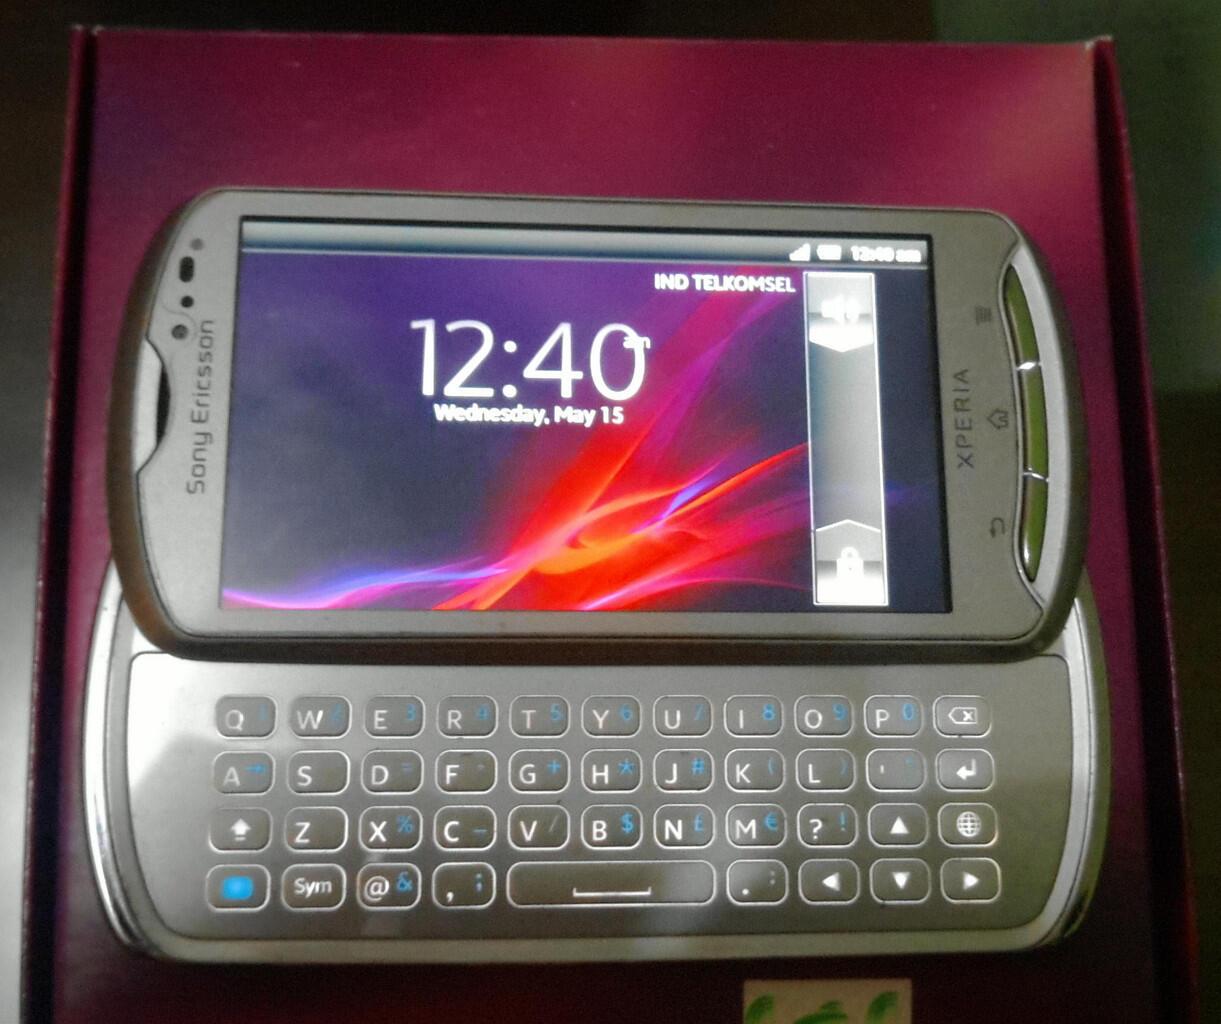 Jual Santai HP Sony Ericsson Xperia Pro MK16i second (BANDUNG),